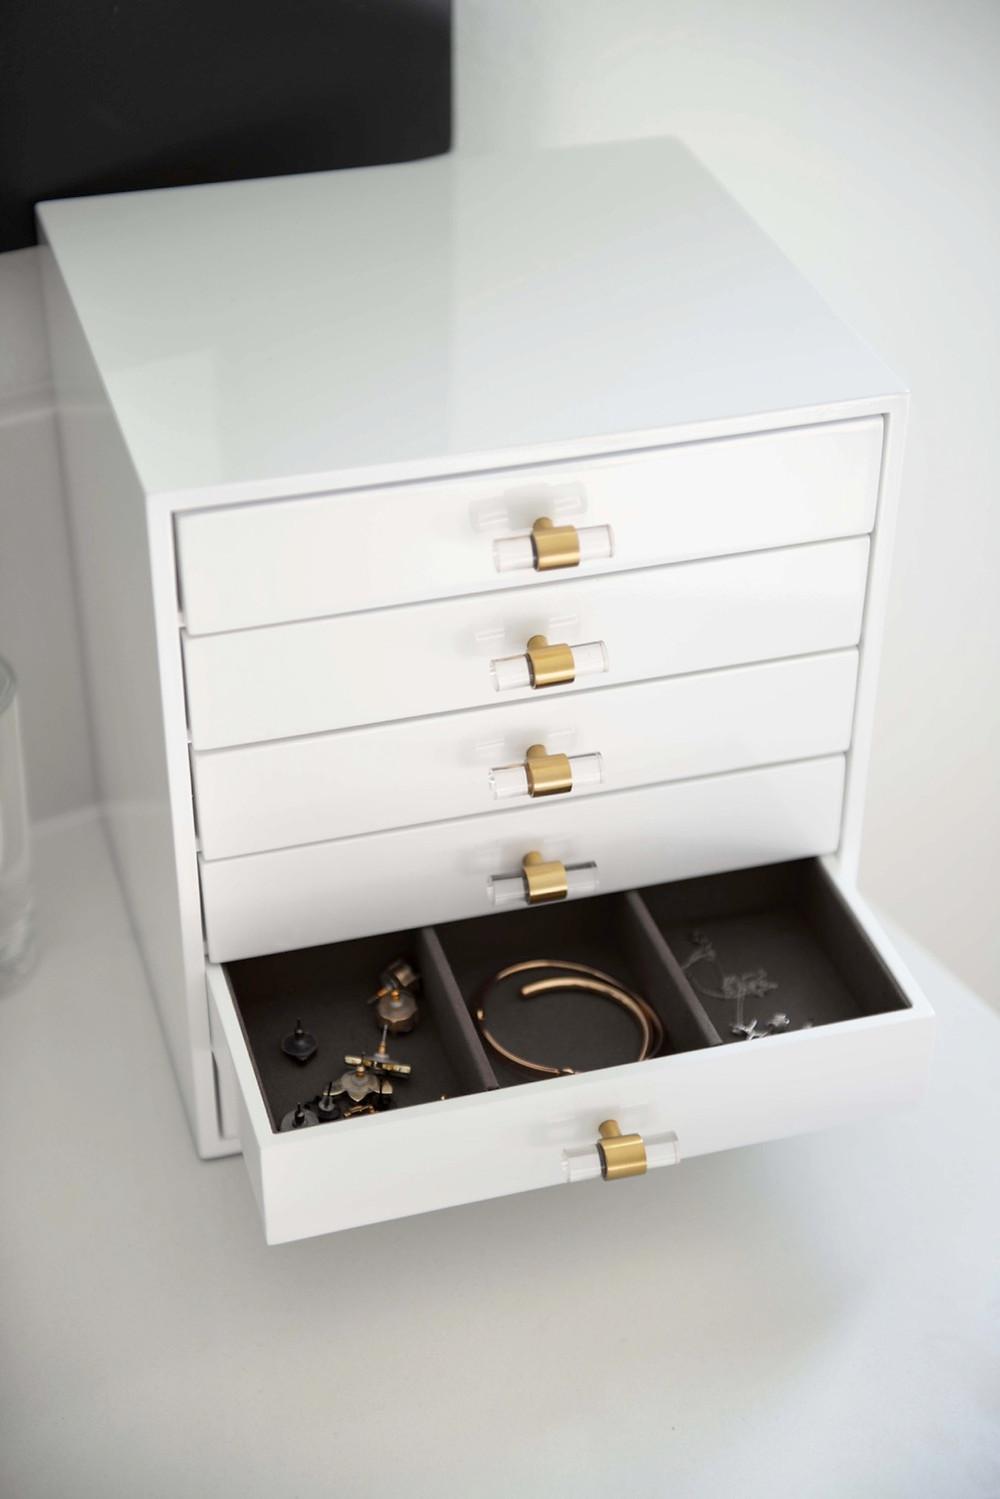 Kendra Scott jewelry box sitting on a luxury bathroom